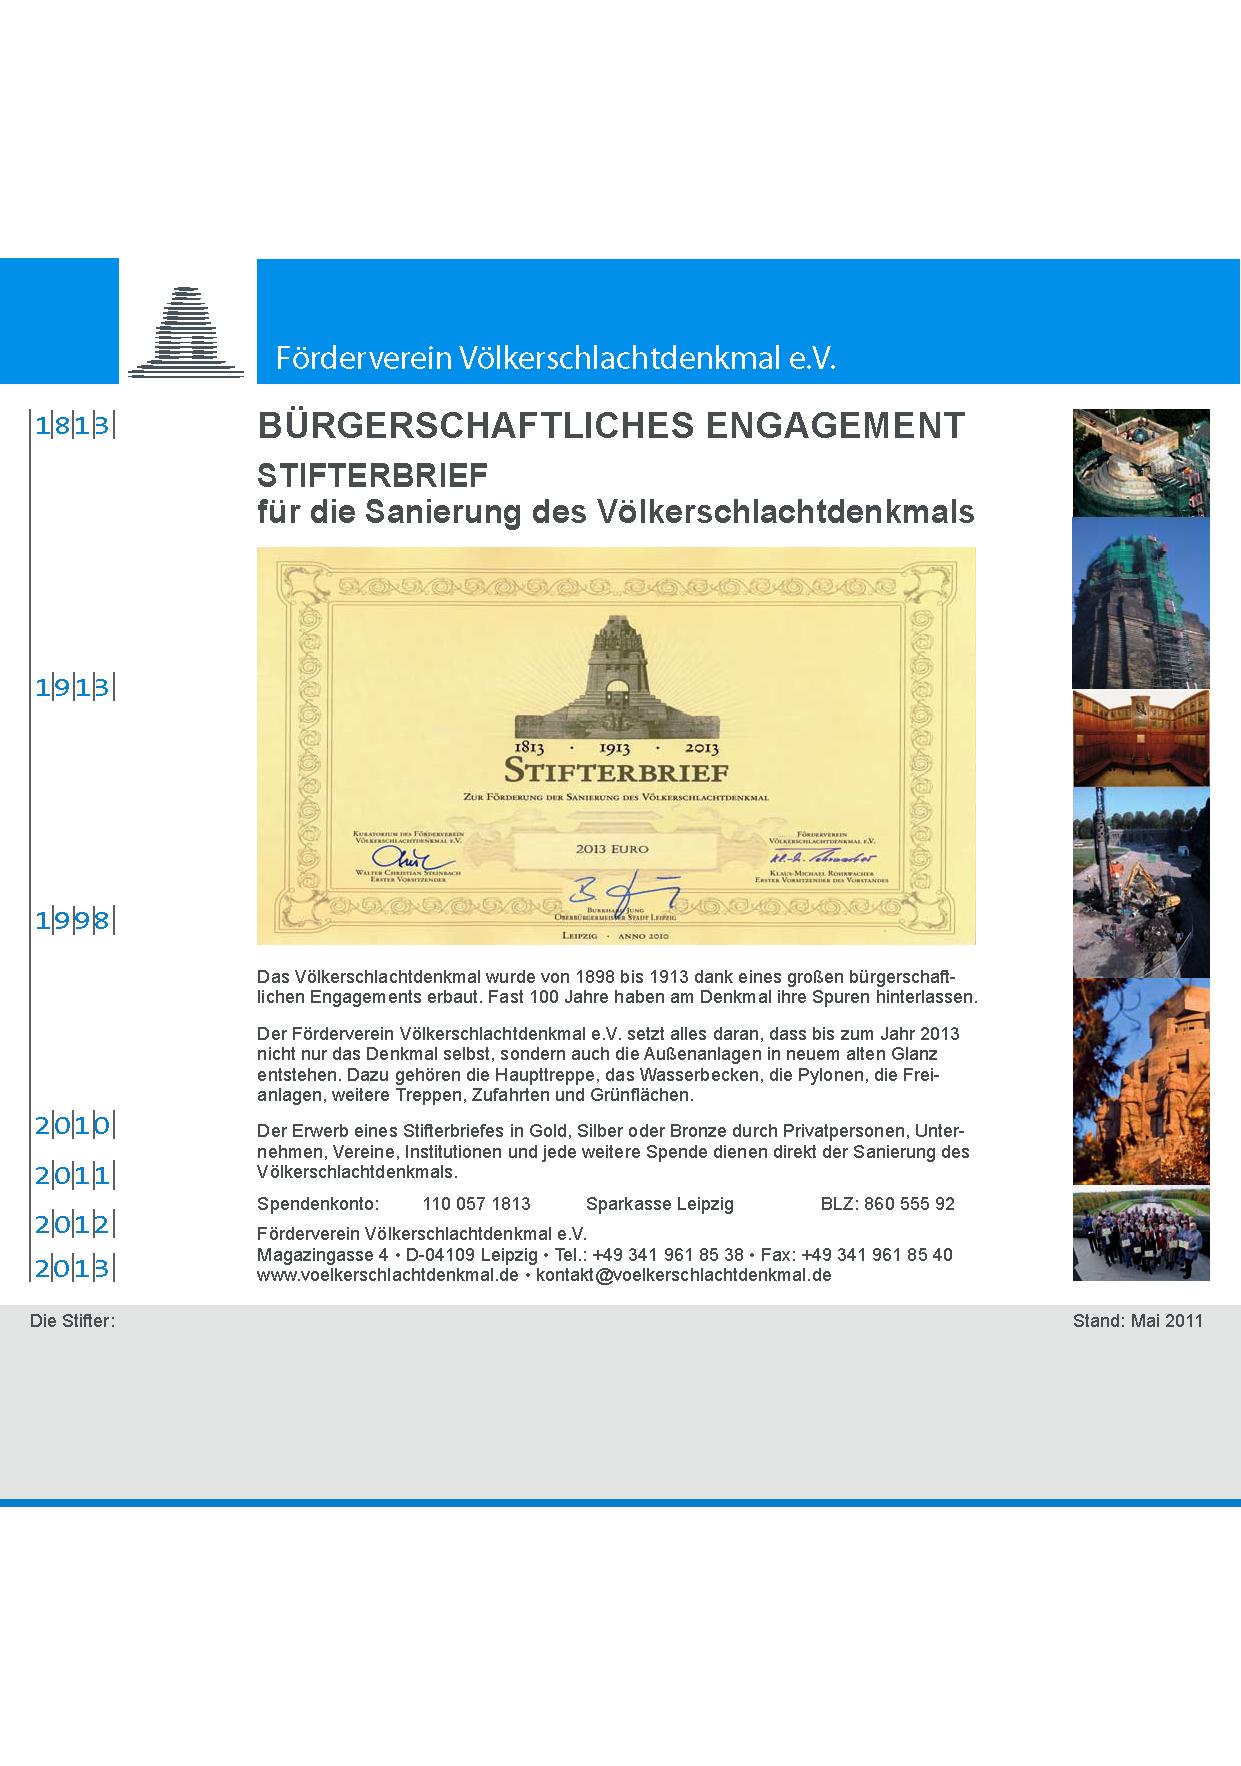 Förderverein Völkerschlachtdenkmal e.V. - Einweihung der ...